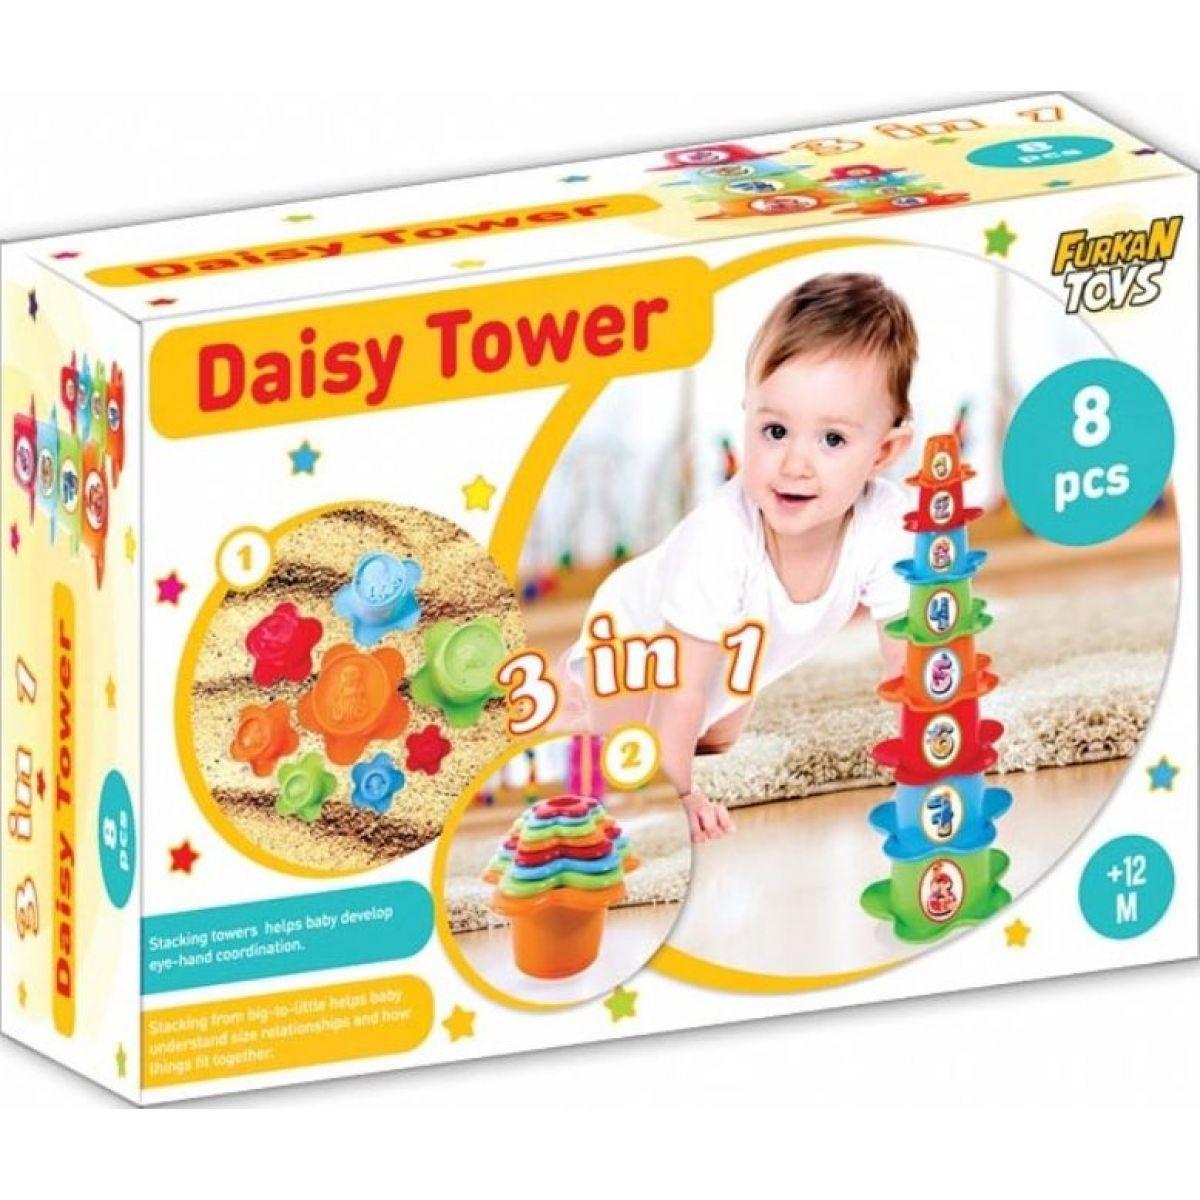 Furkan Toys skládací kelímky 3 v 1